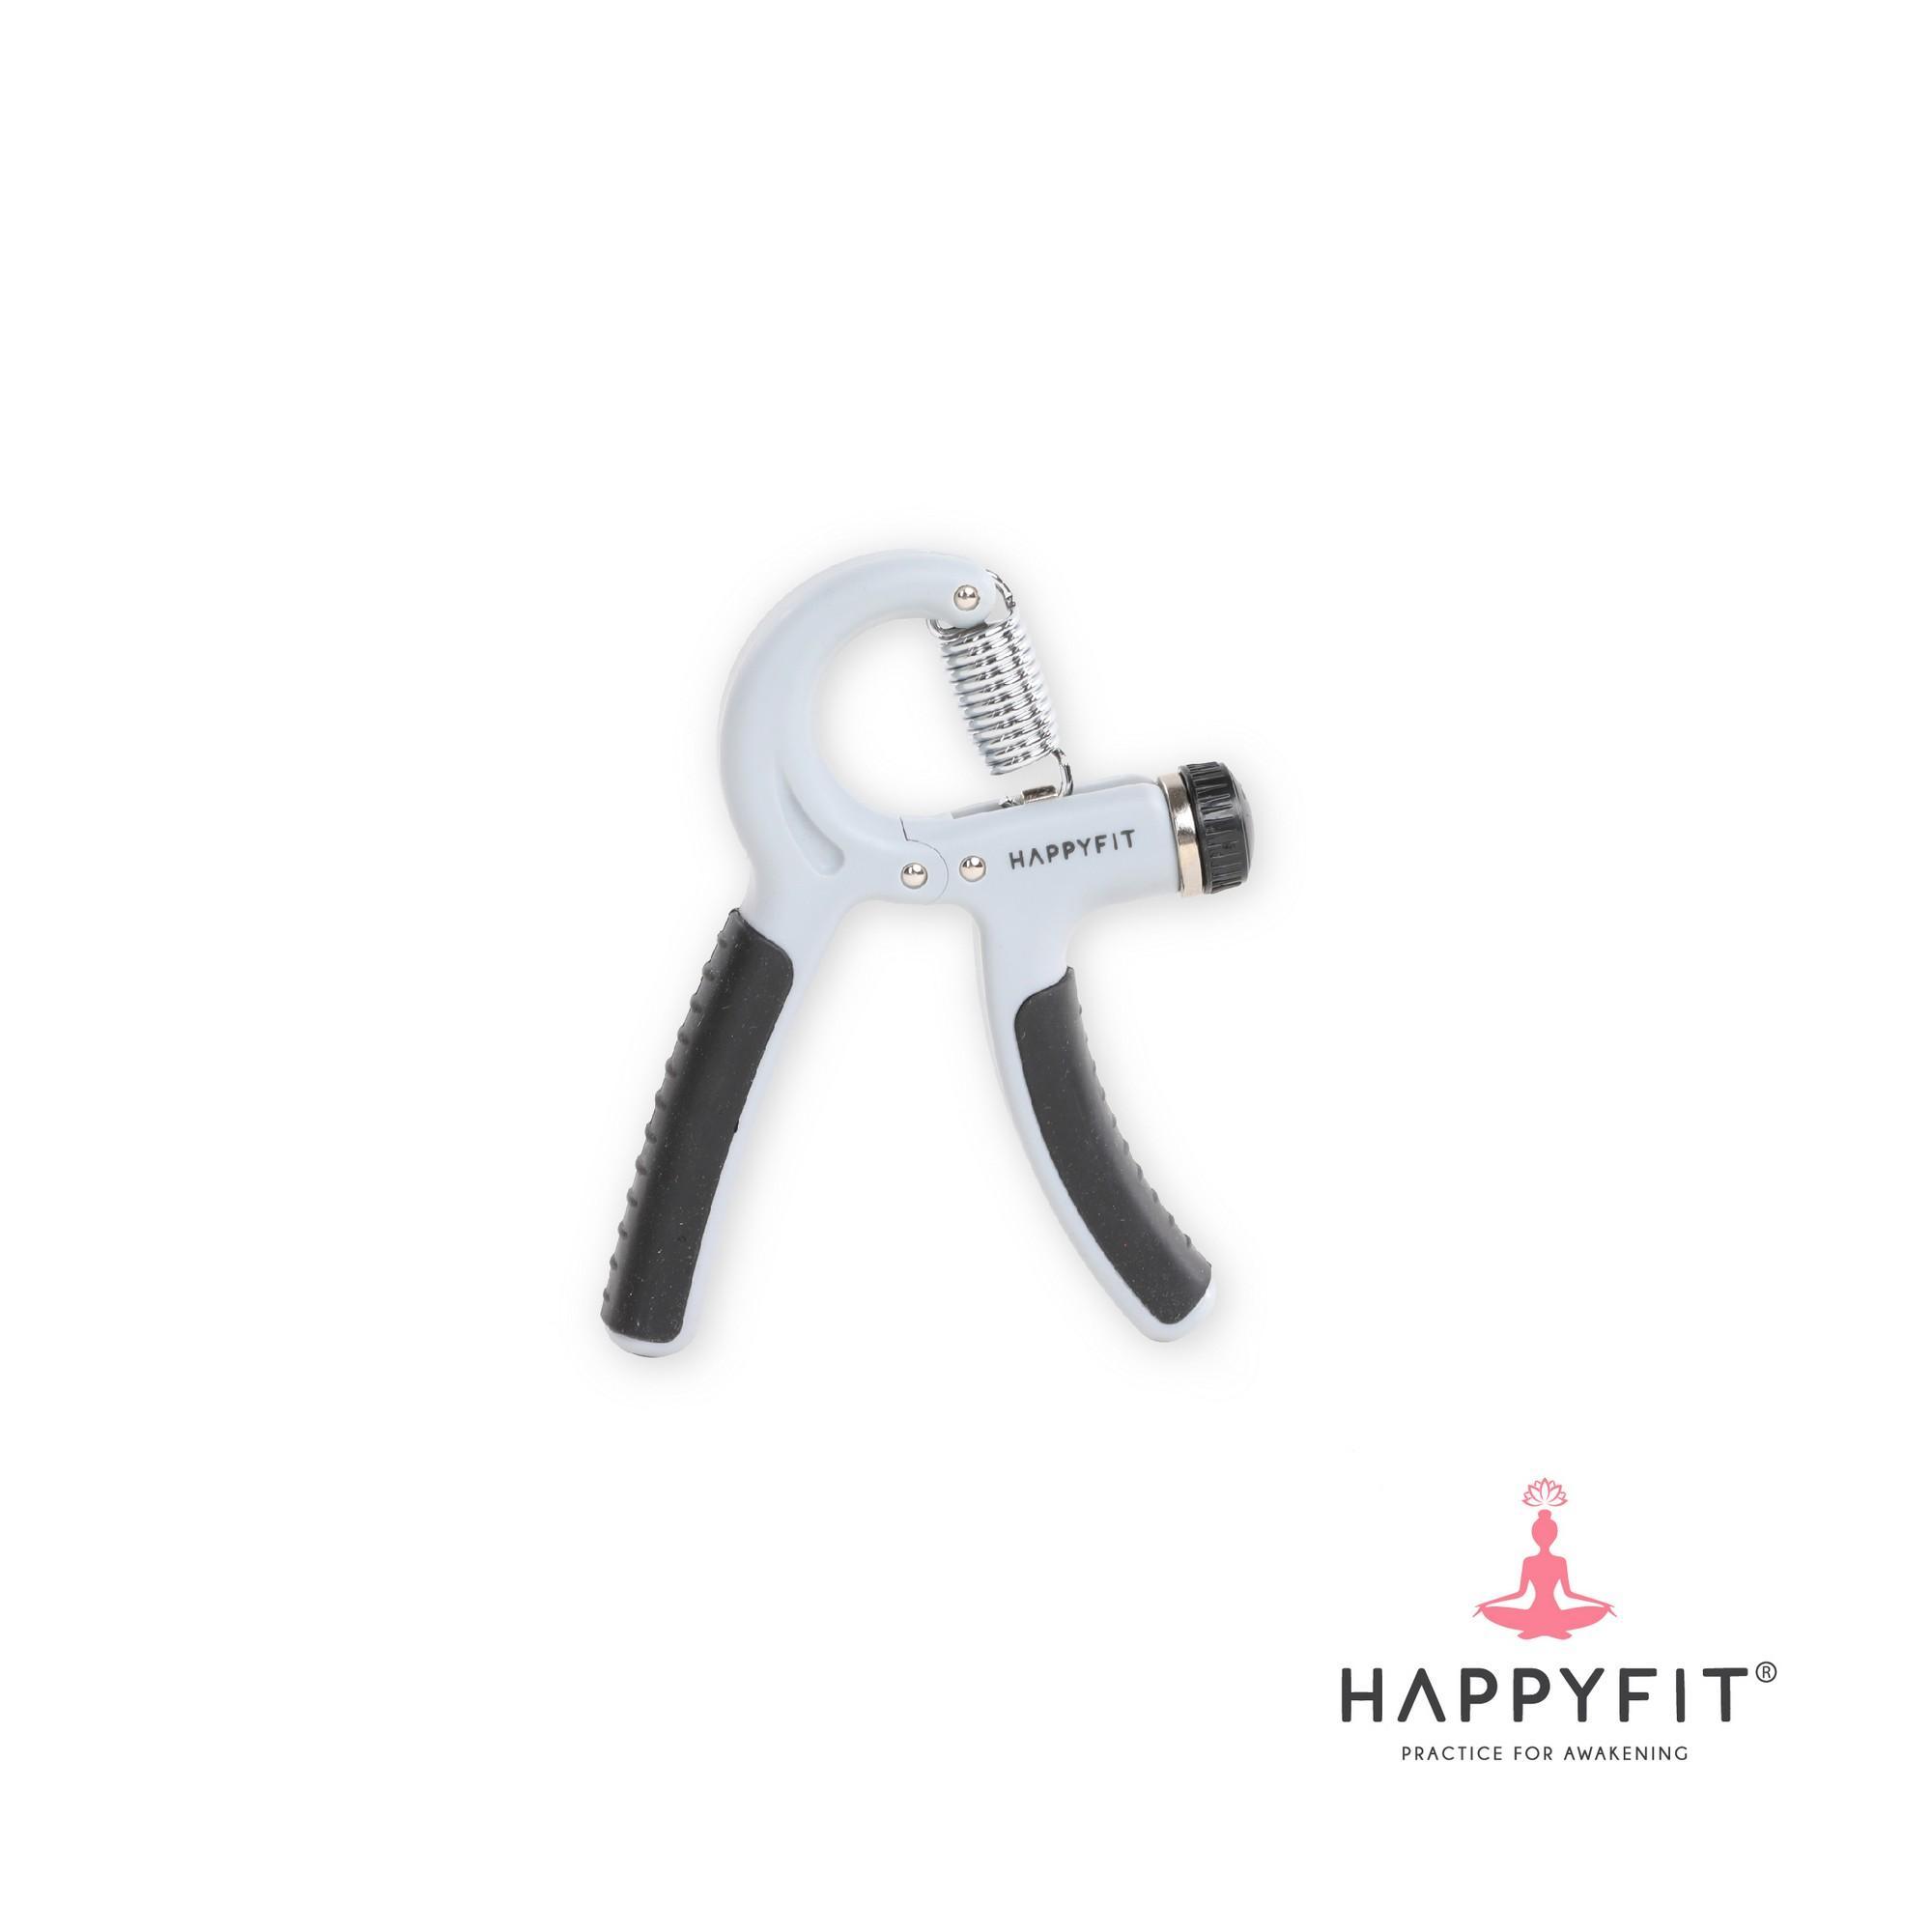 Happyfit High Quality Adjustable Hand Grip - Grey By Happyfit Indonesia.